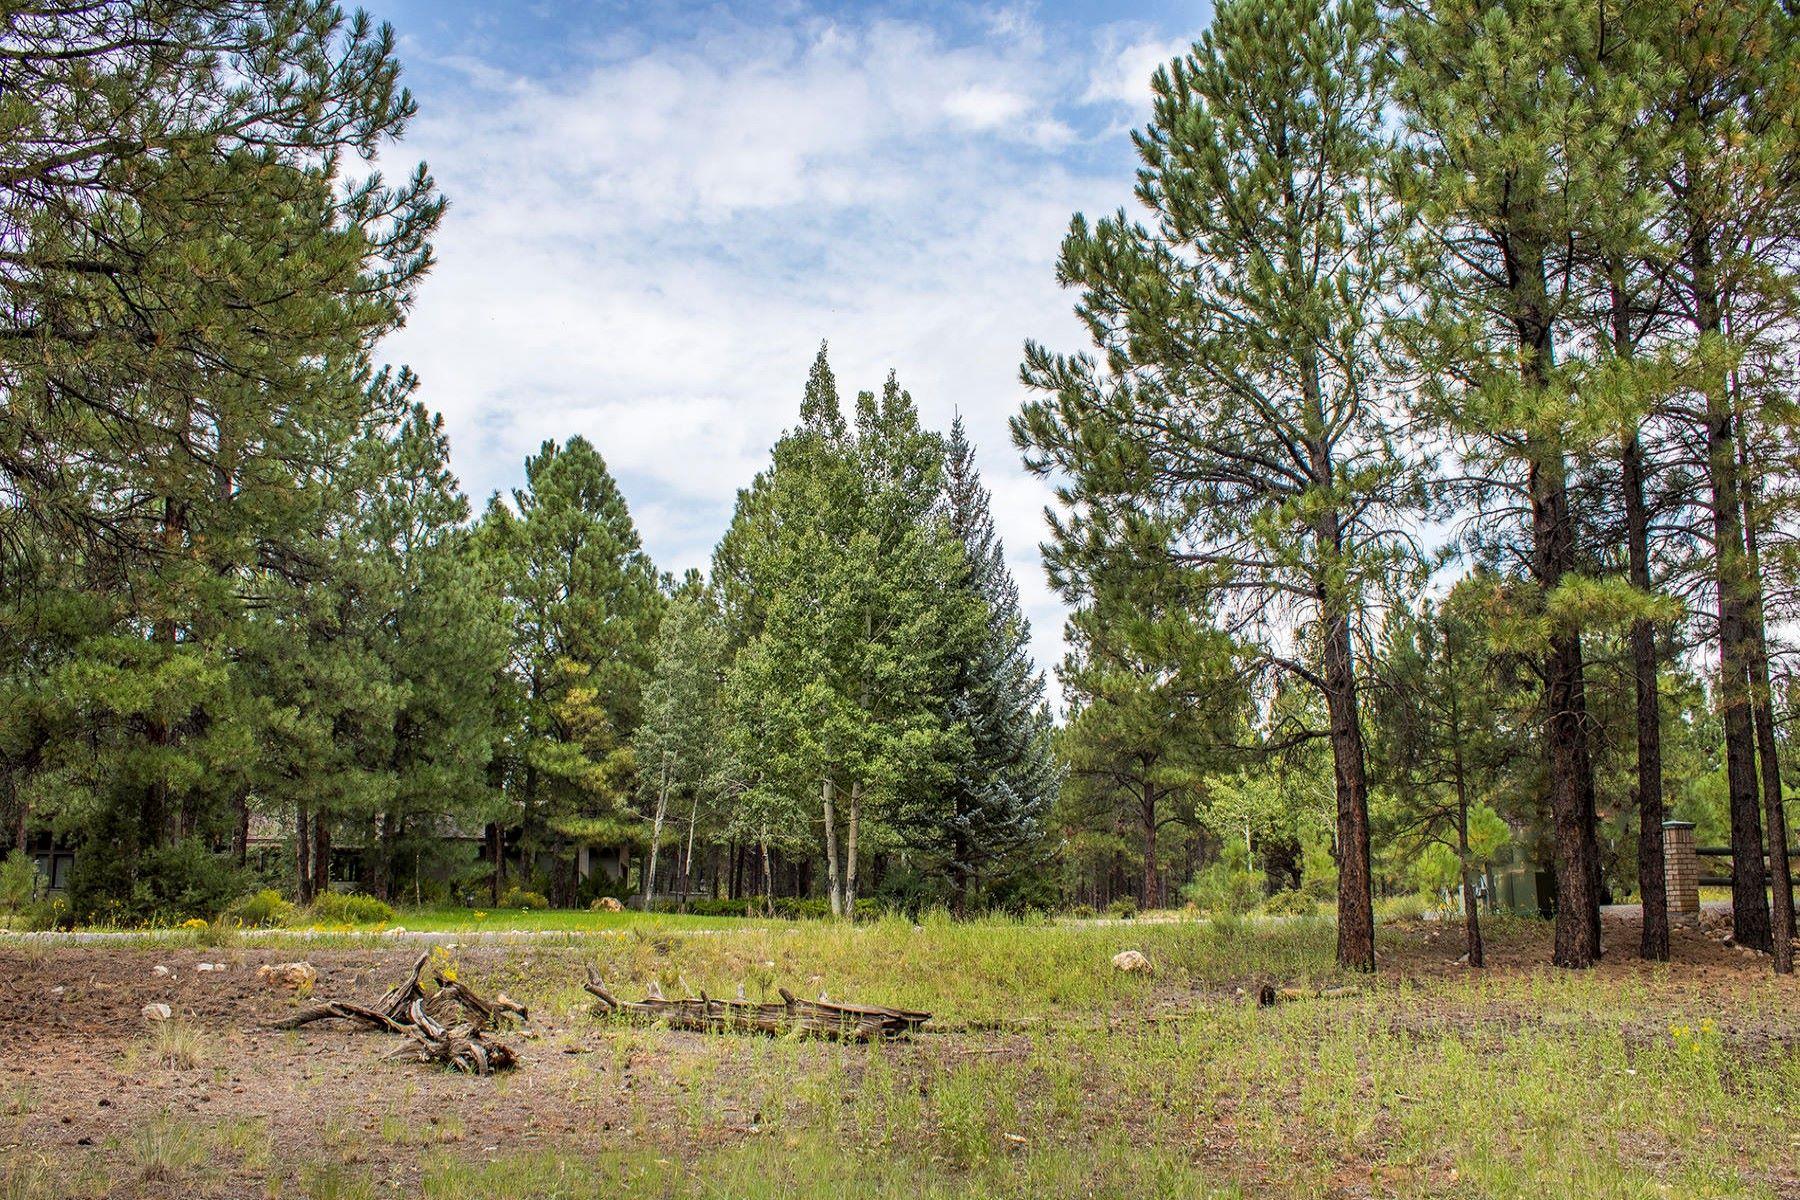 Земля для того Продажа на Build Your Home on This Lakeside Lot 5025 E Lake Country RD, Flagstaff, Аризона, 86004 Соединенные Штаты